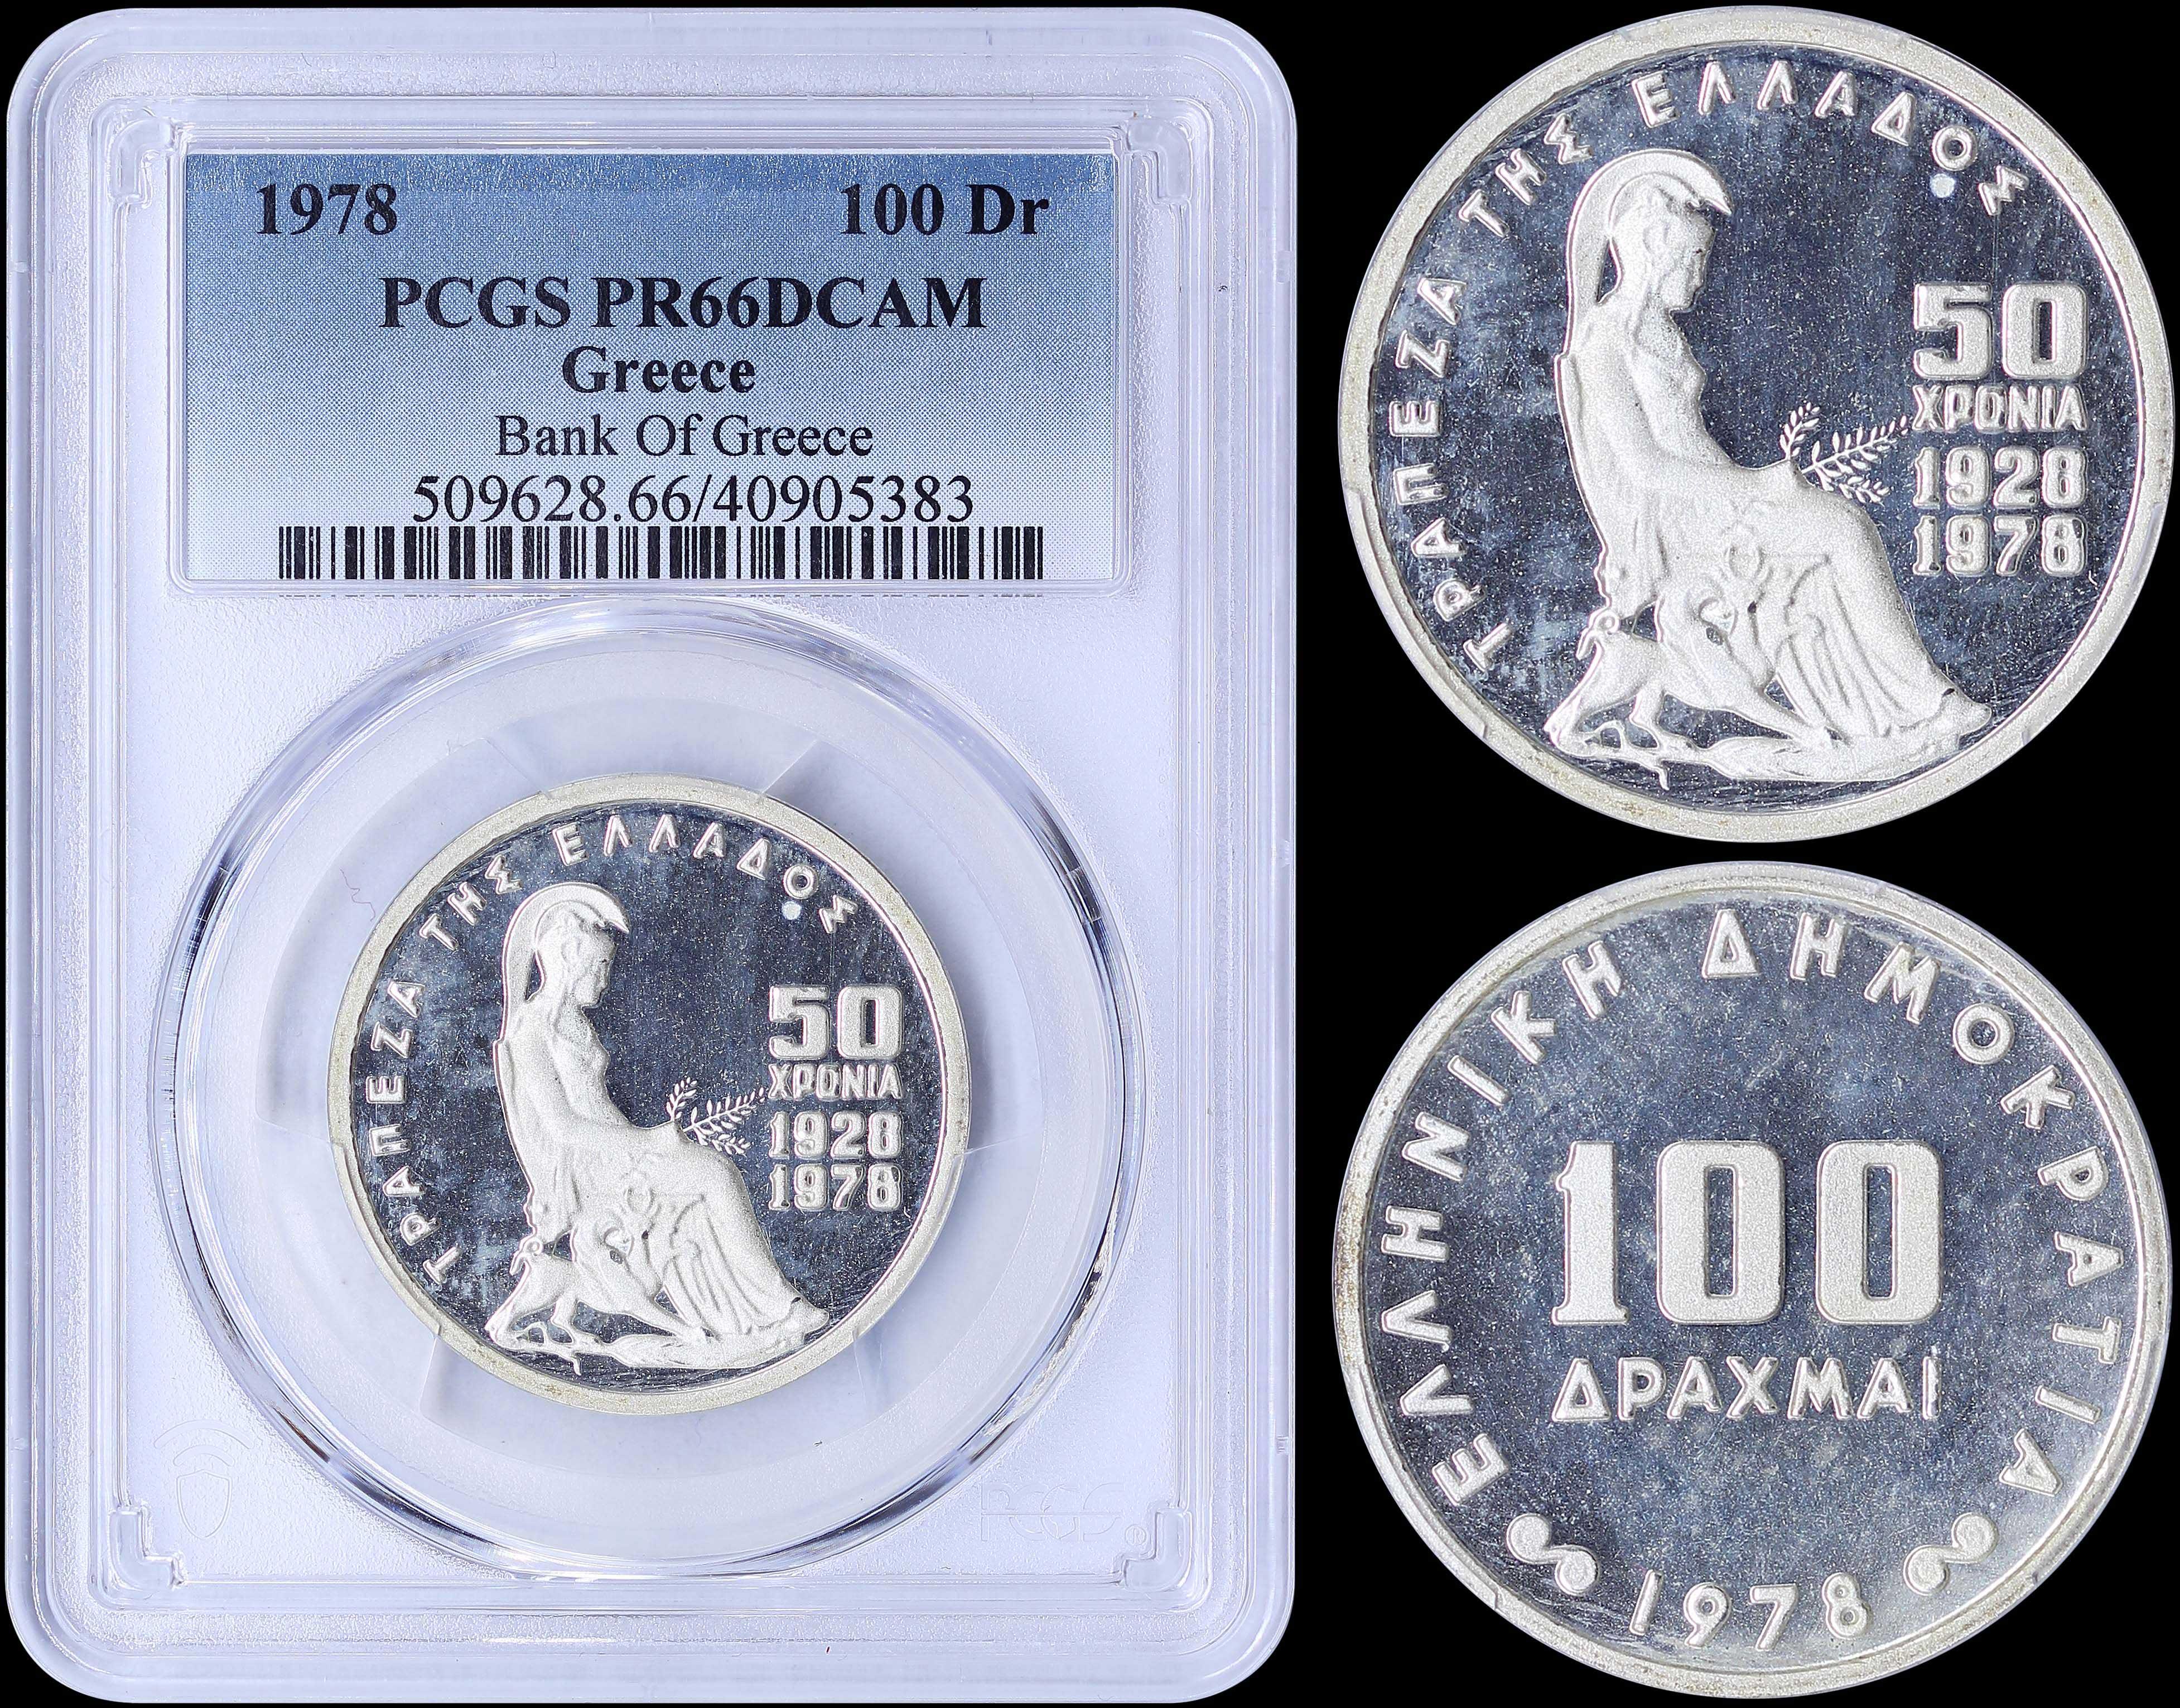 Lot 6197 - -  COINS & TOKENS HELLENIC REPUBLIC & COMMEMORATIVE ISSUES -  A. Karamitsos Public & Live Internet Auction 682 (Part A) Coins, Medals & Banknotes